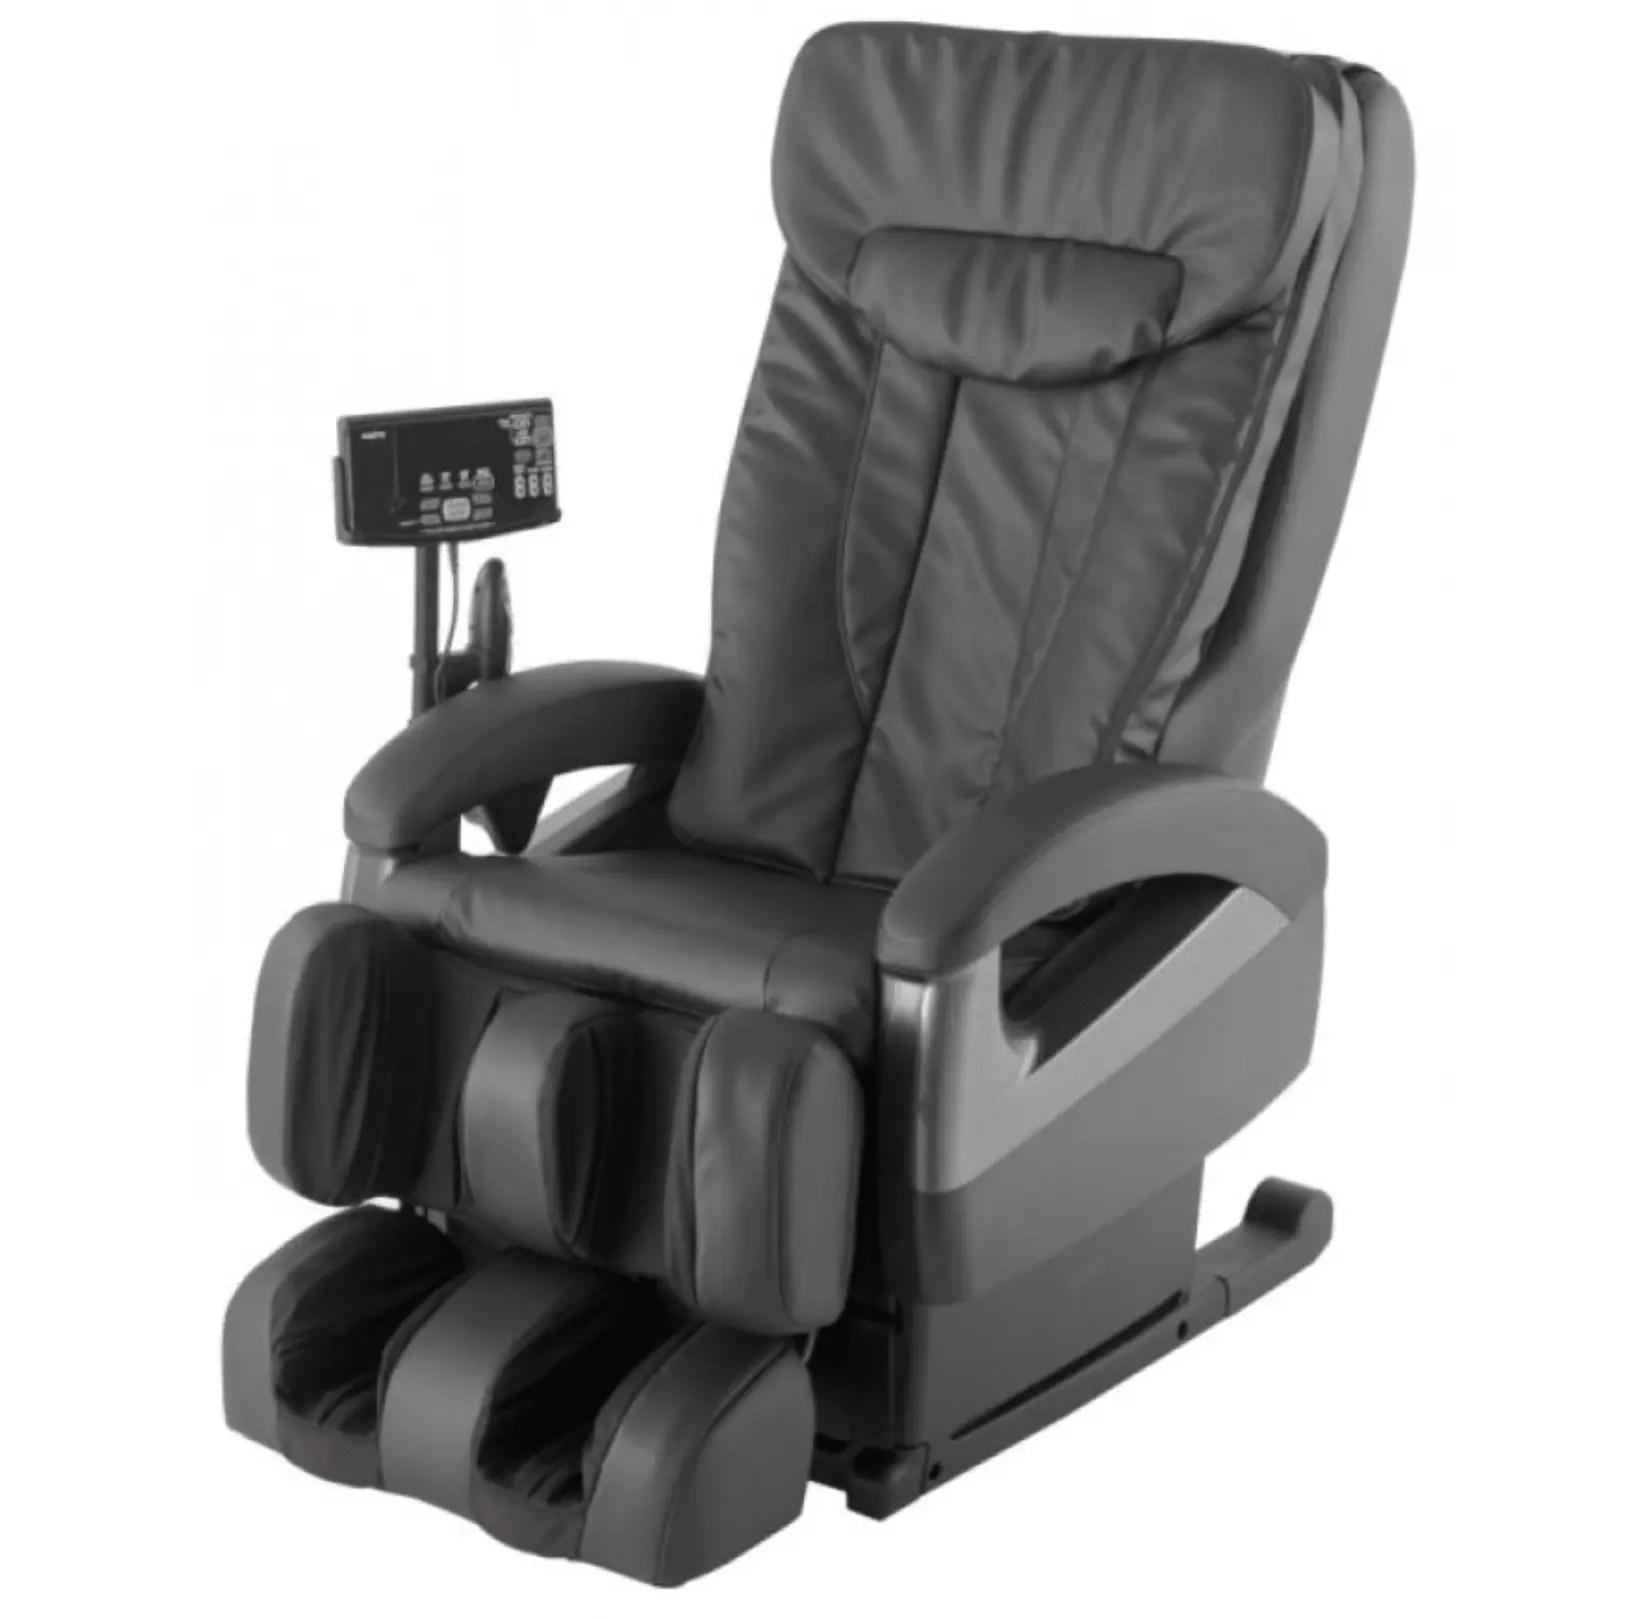 Sanyo DR5700 Massage Chair Body Massage Shop